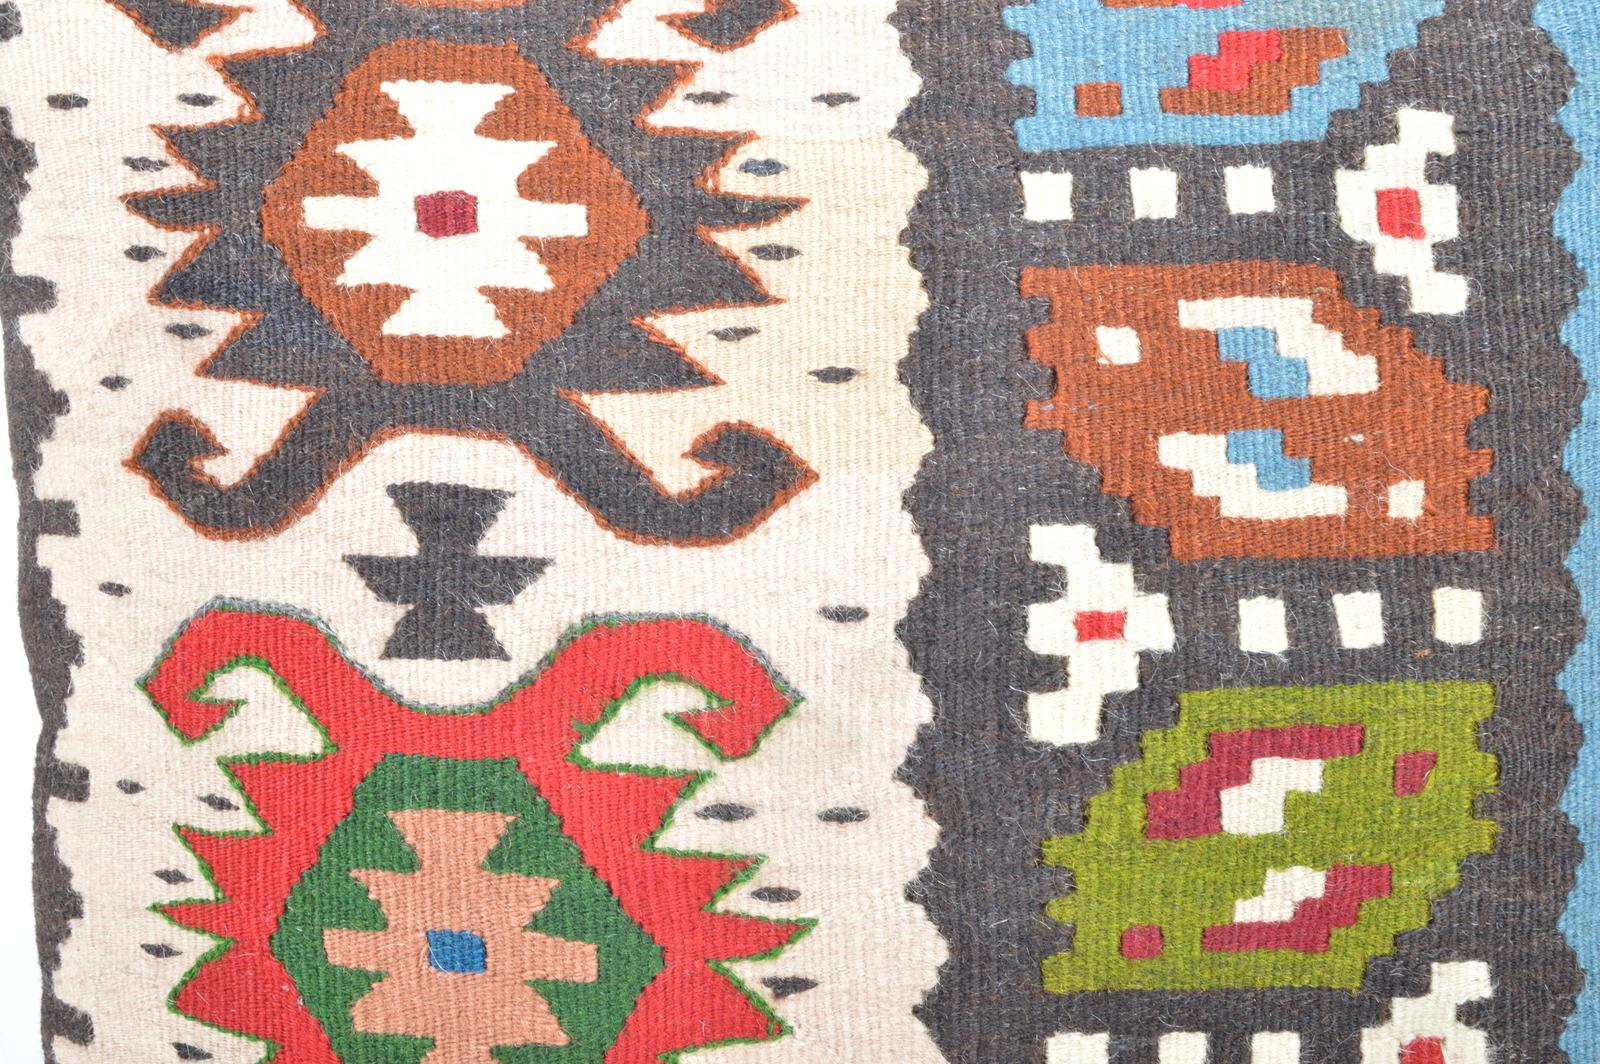 kilim pillow 16x16inc kilim Cushion Cover,Ethnic Anatolian Kilim  Pillow 40x40cm